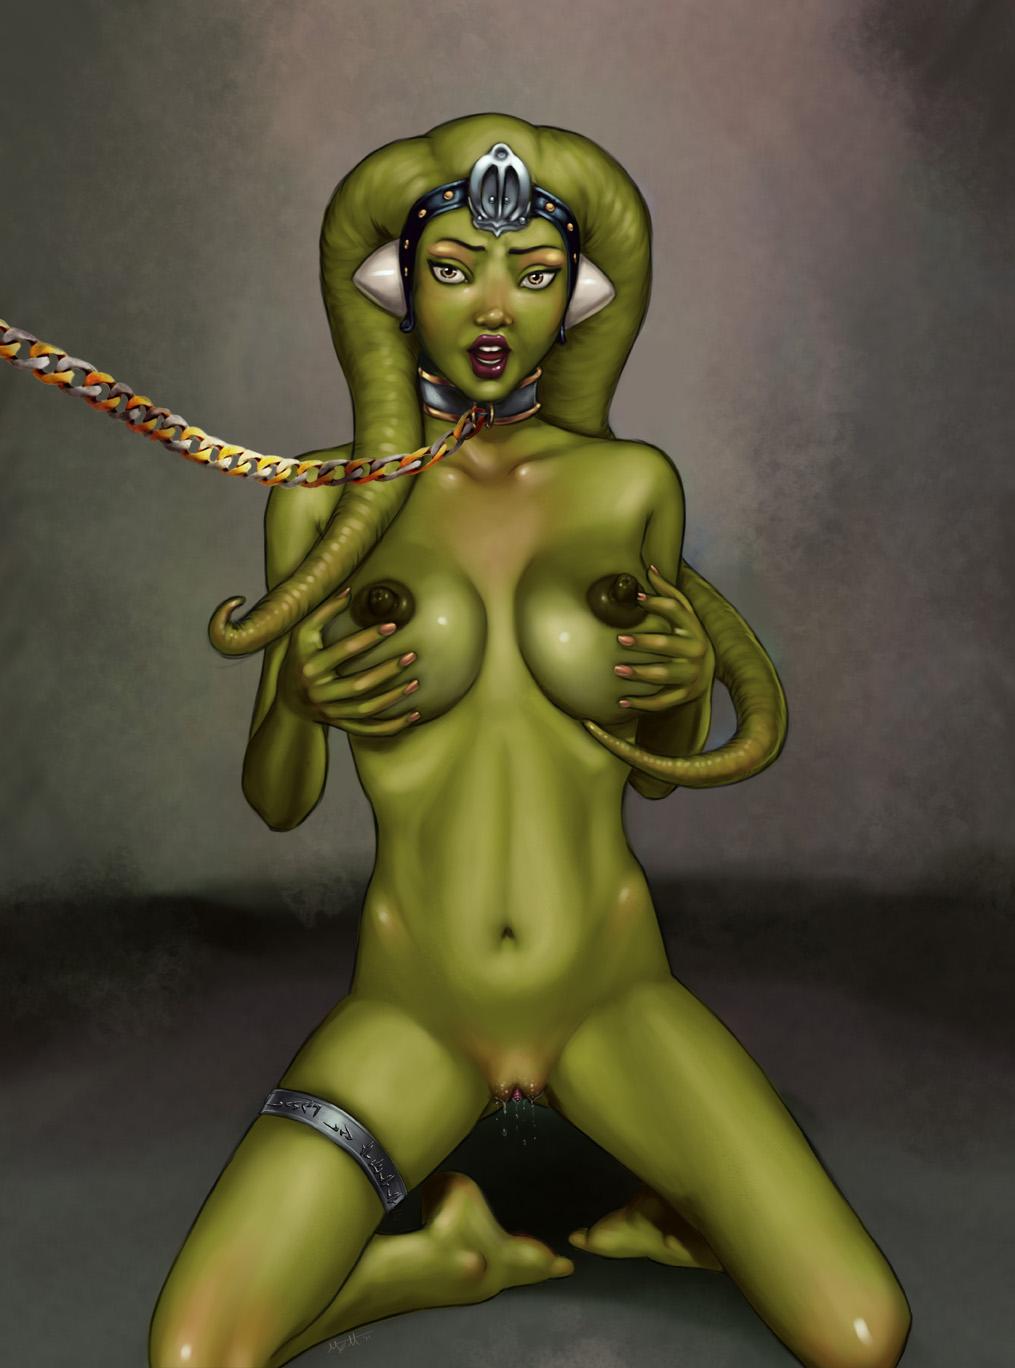 Star wars toon nude